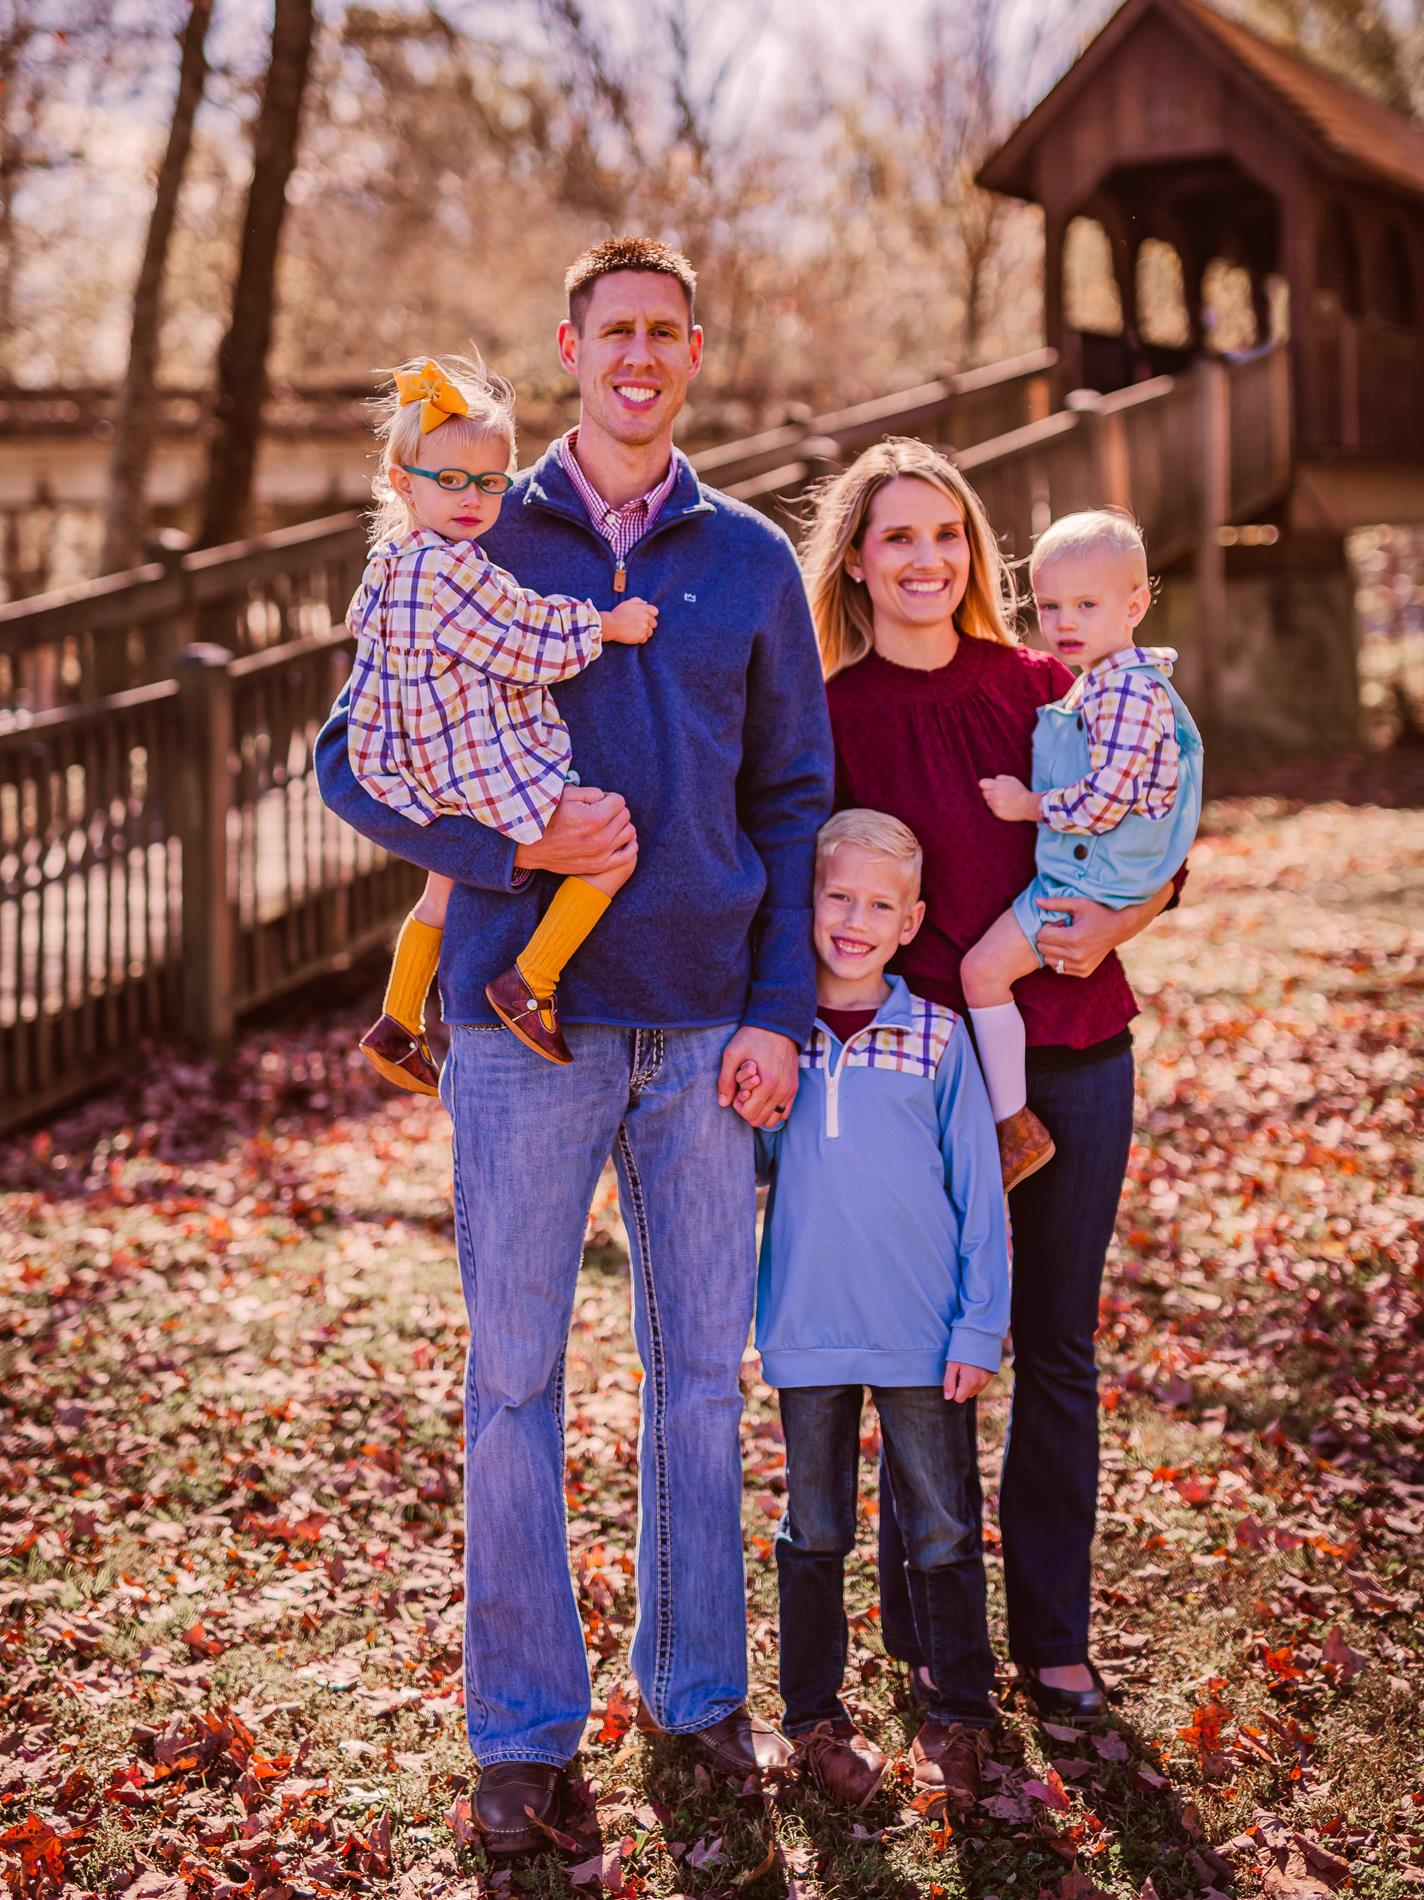 Chelsee Thornton & Family